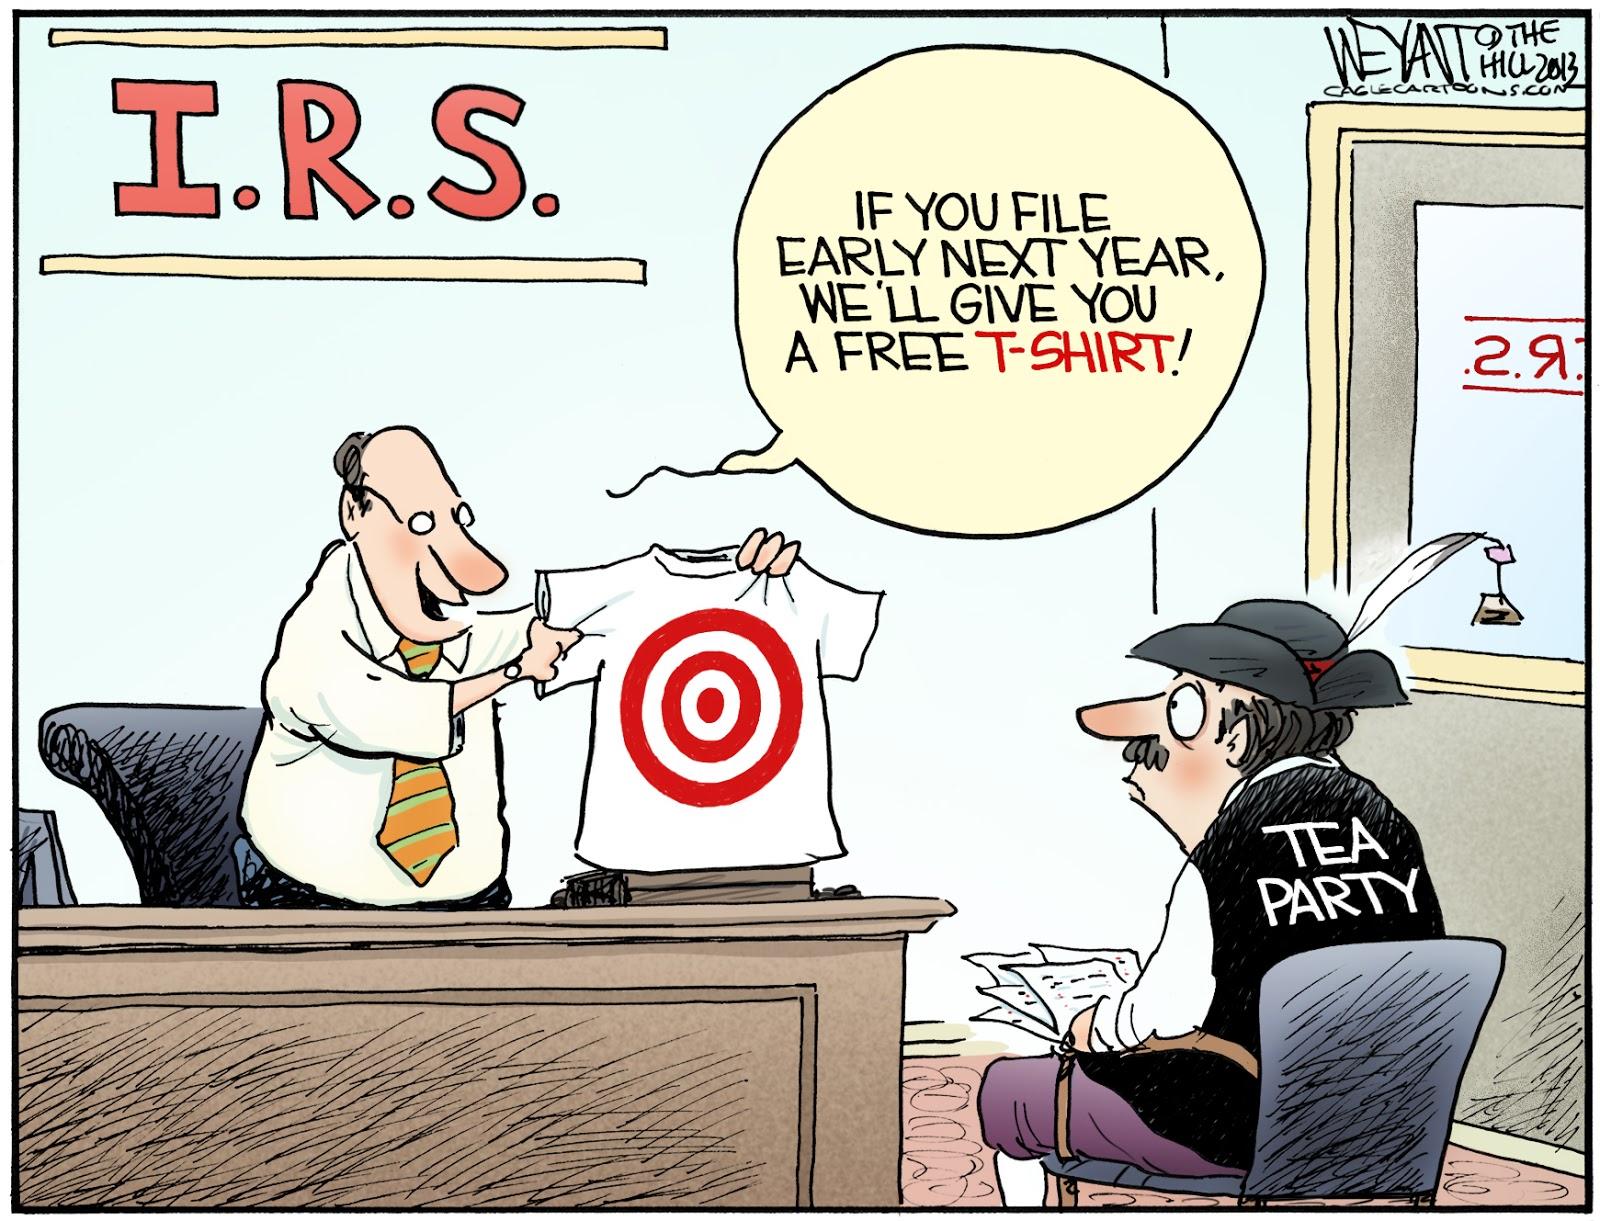 irs-tea-party-cartoon-weyant